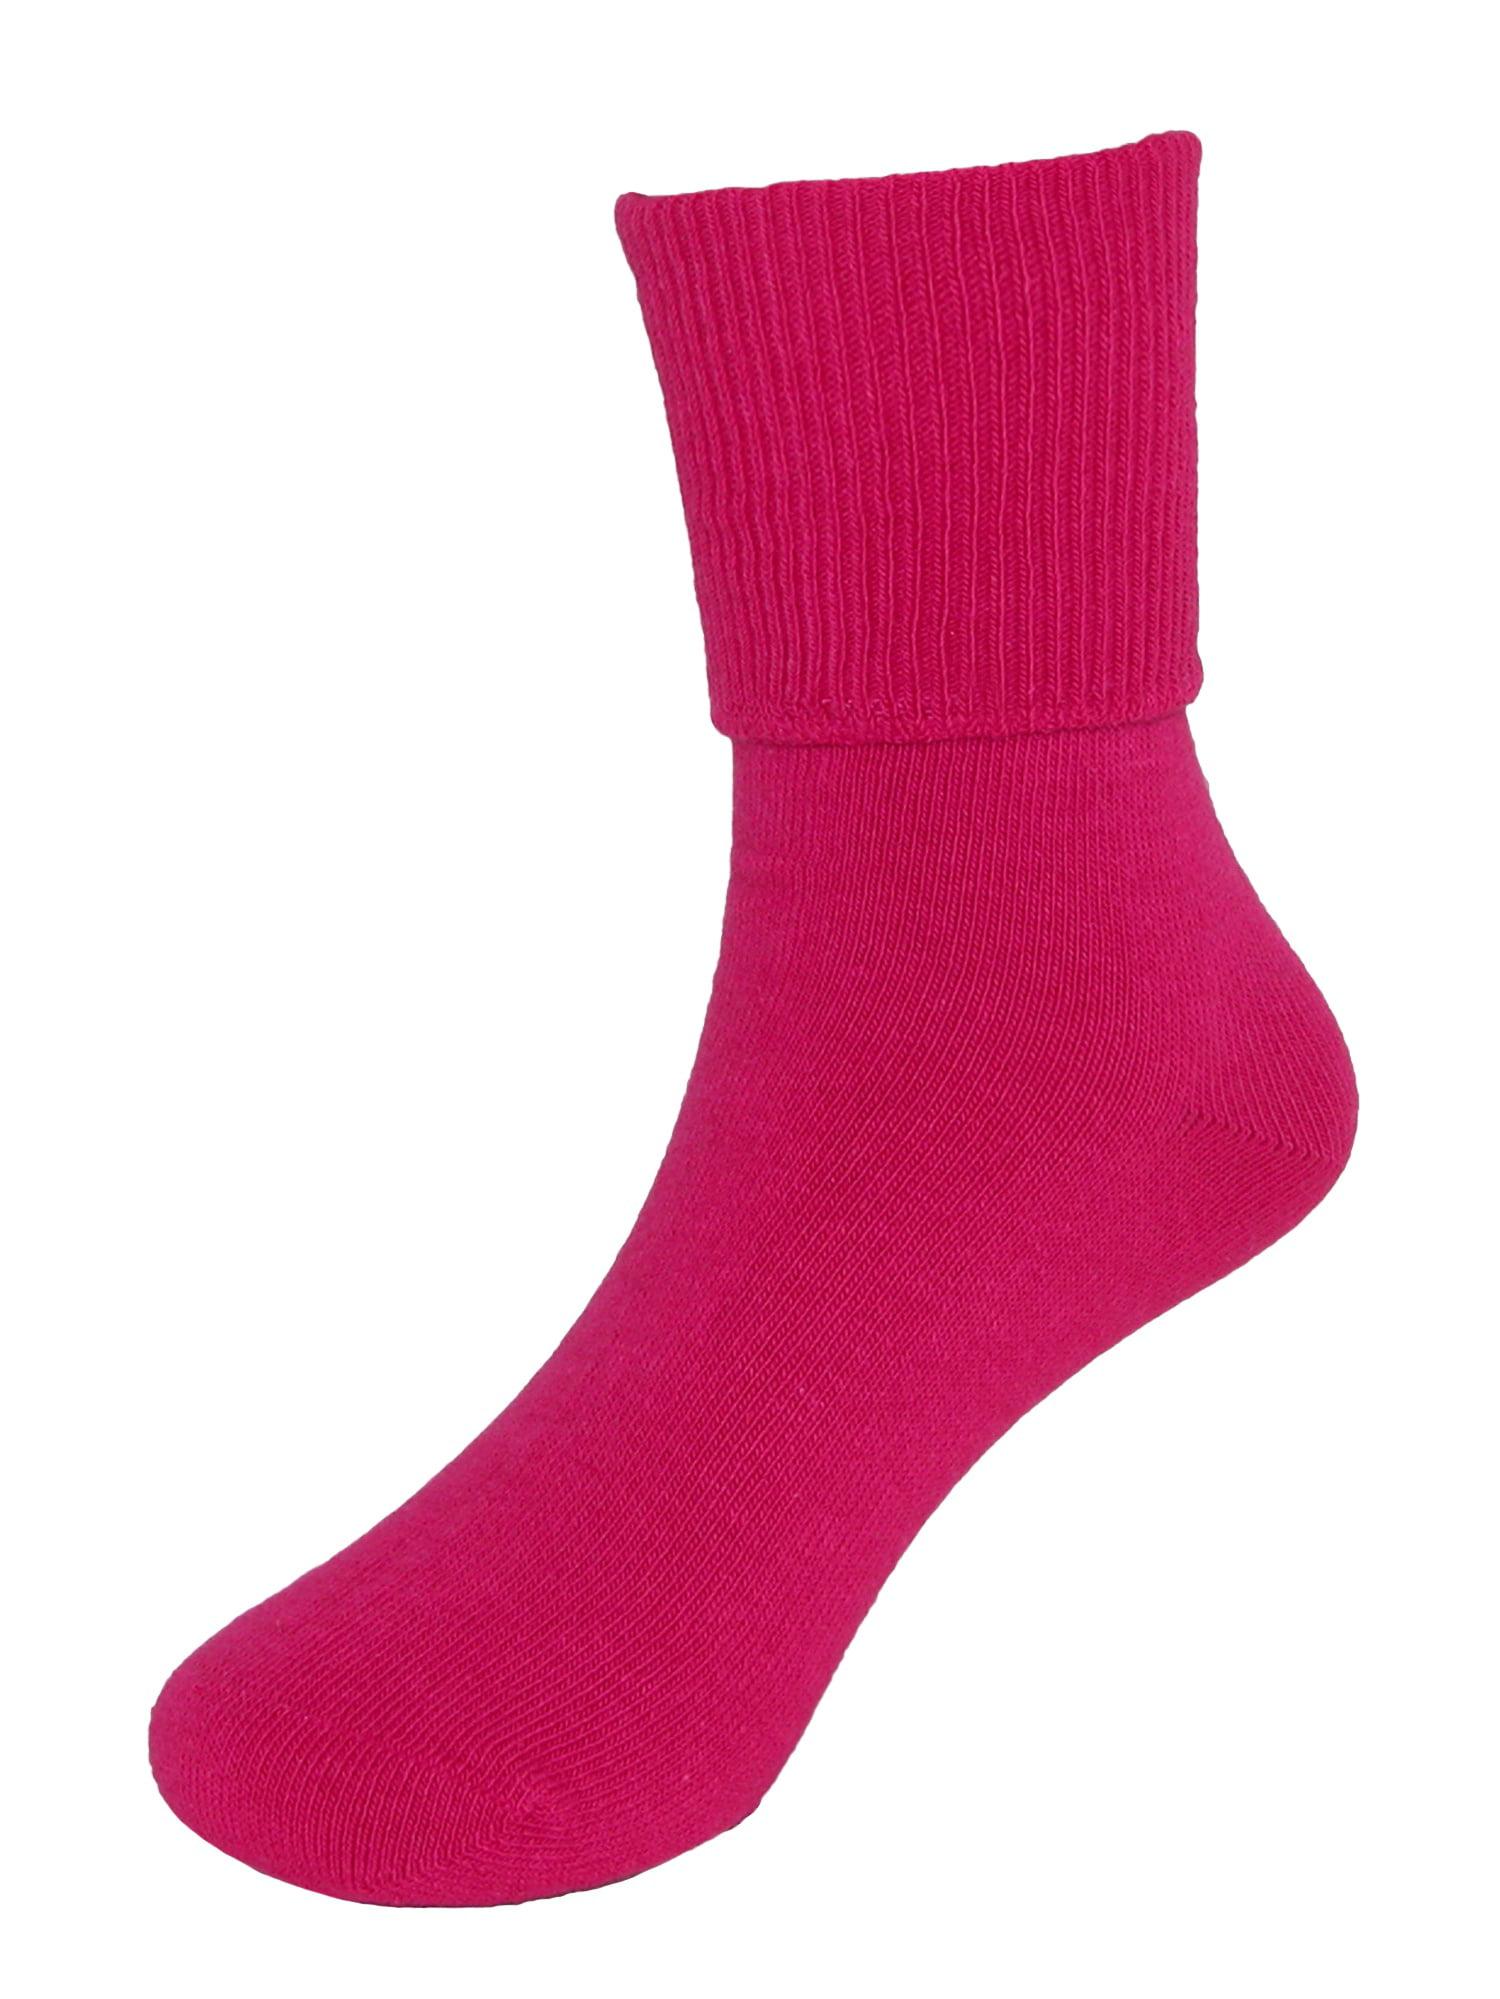 Girl's Seamless Turn Cuff Anklet Socks (6 Pair Pack)